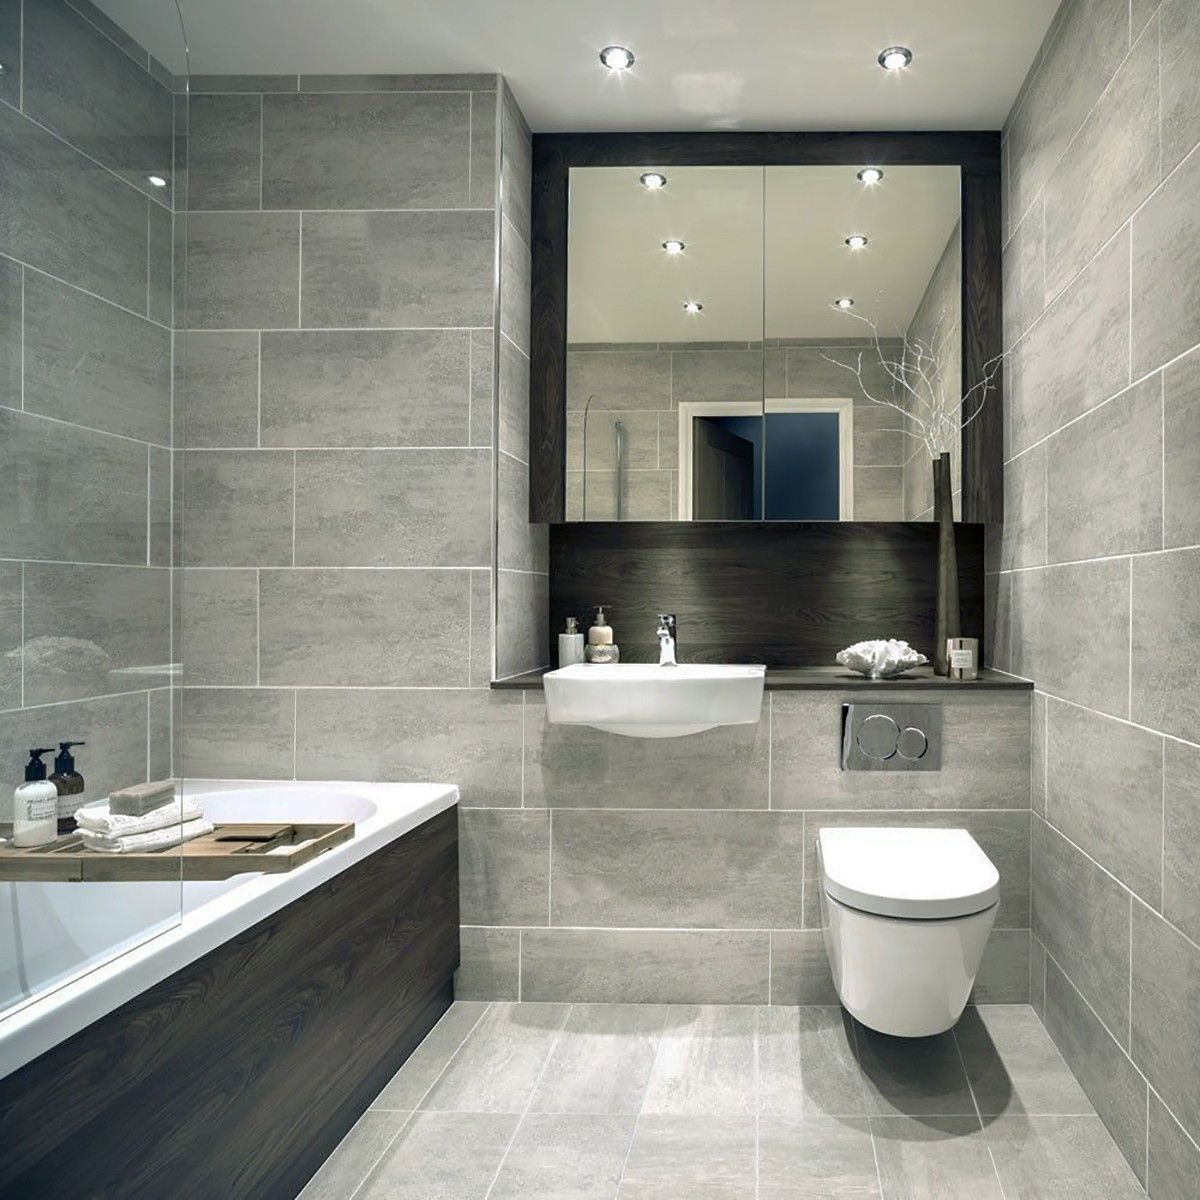 10-30sqm 61.3×30.3cm Indiana Grey Matt Porcelain Wall Tile Room Deal